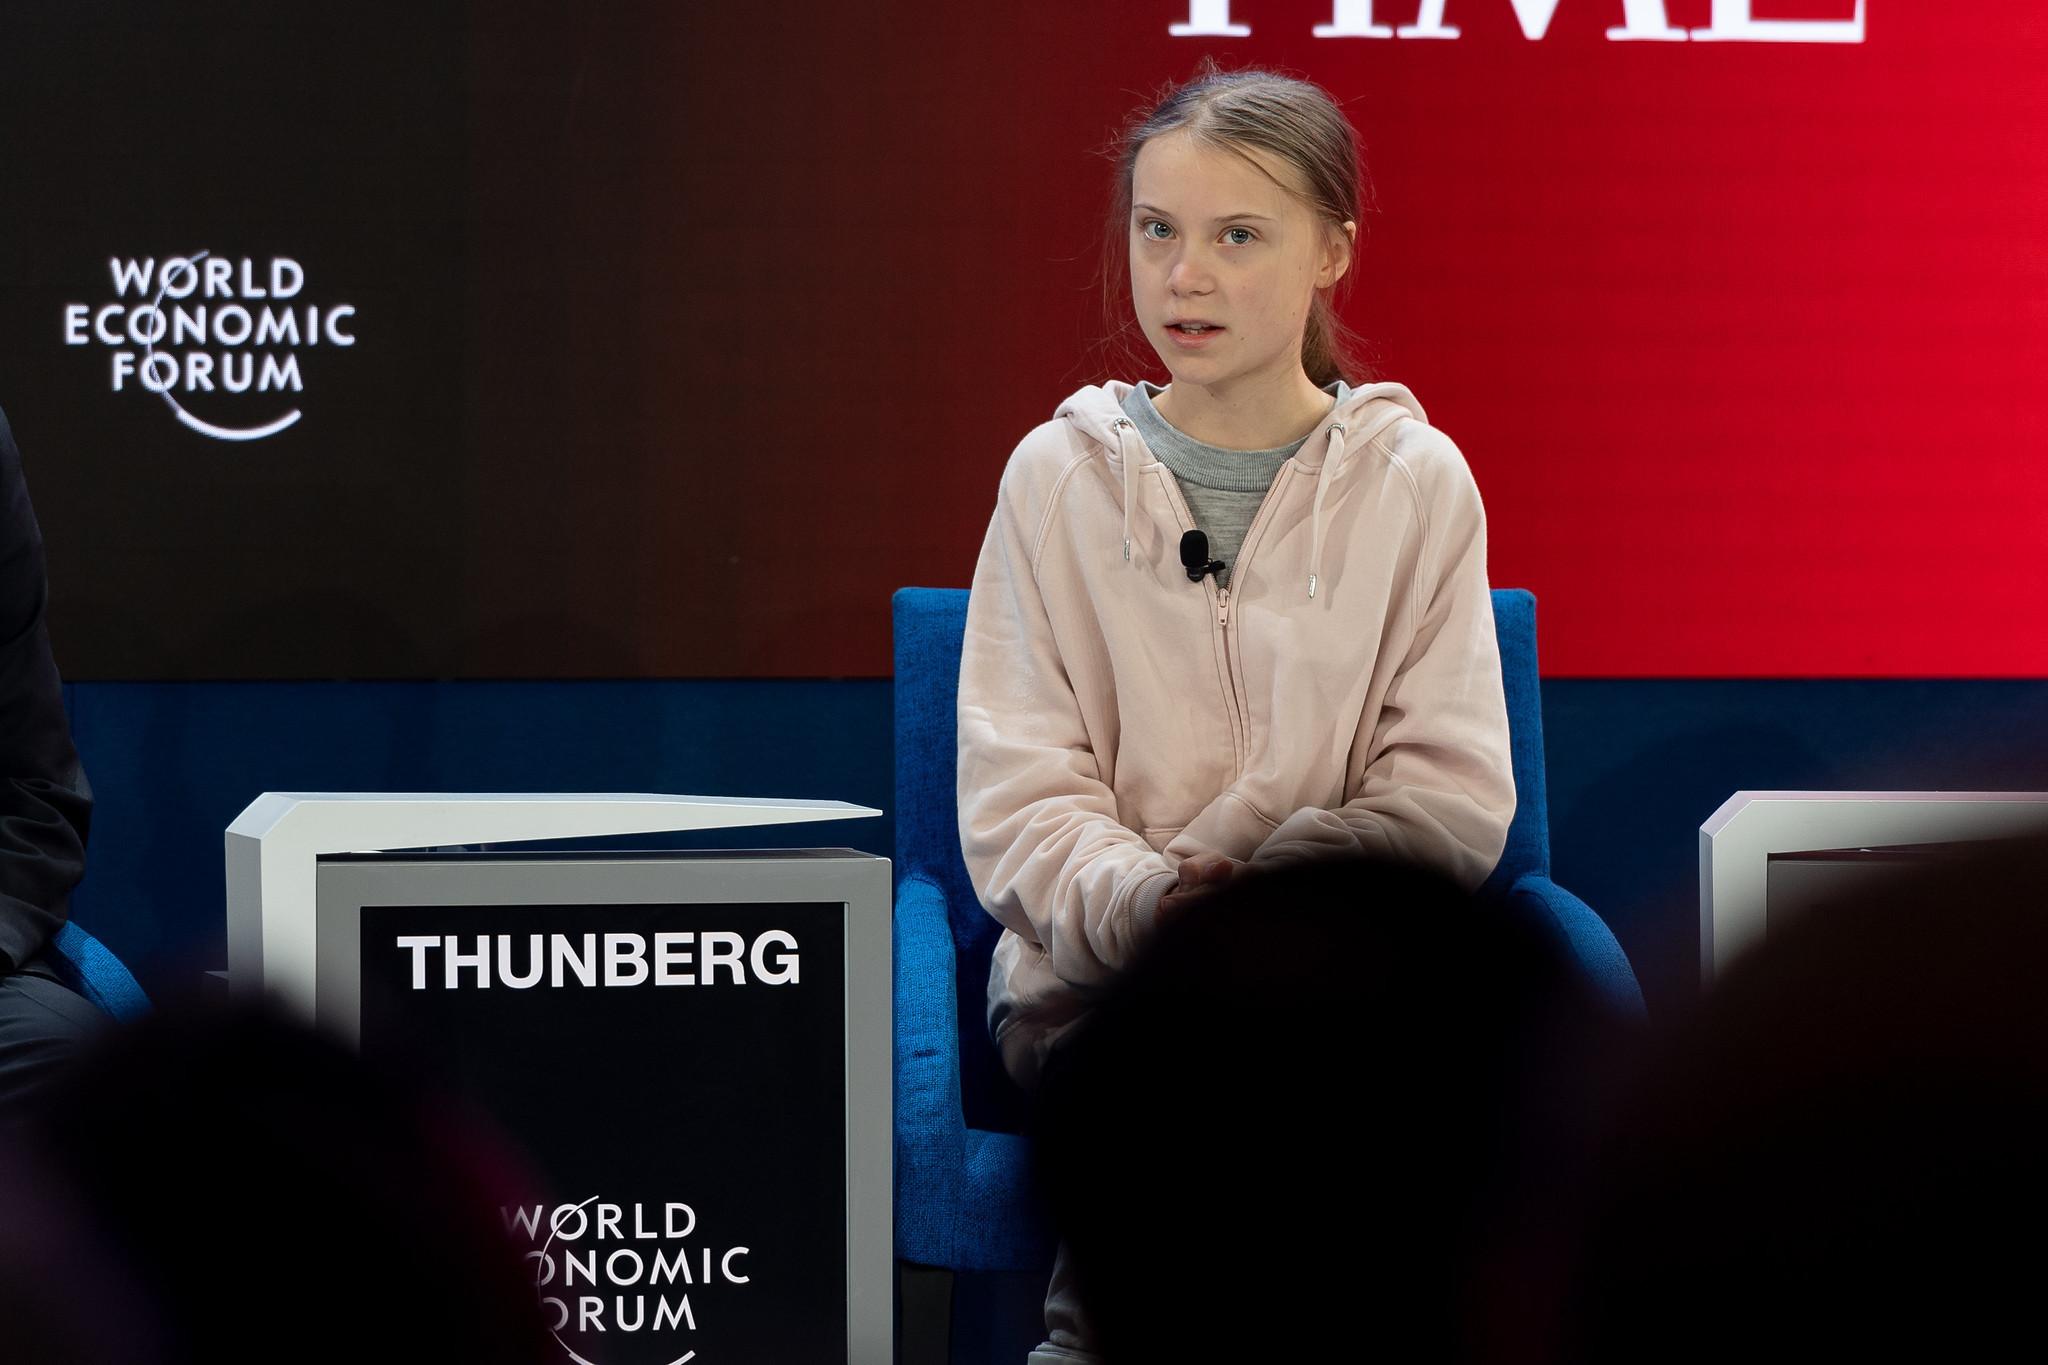 Greta Thunberg Davos Agenda climate change climate emergency ecological crisis